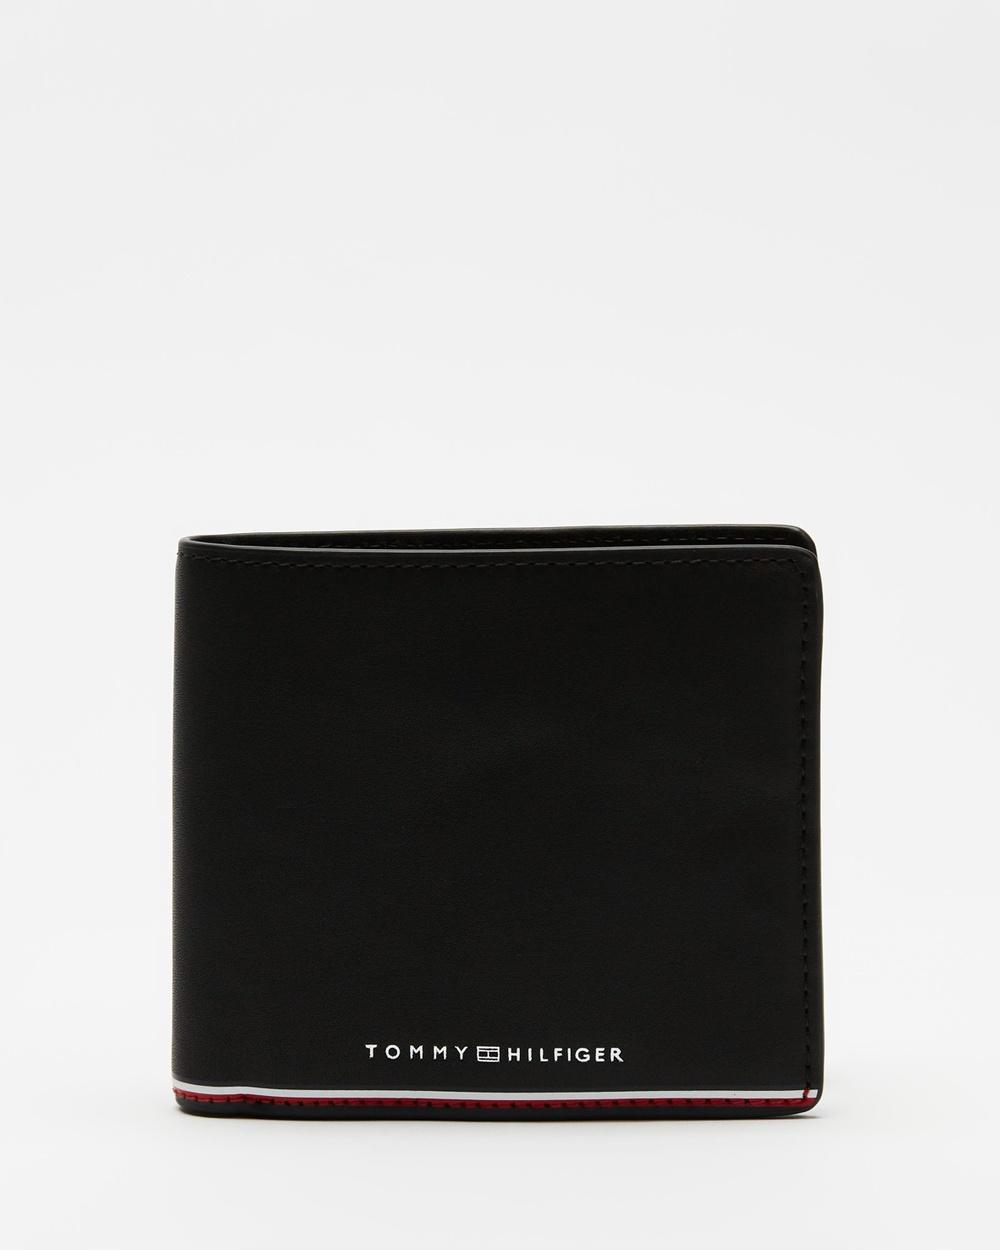 Tommy Hilfiger Commuter Trifold Wallet Wallets Black Australia